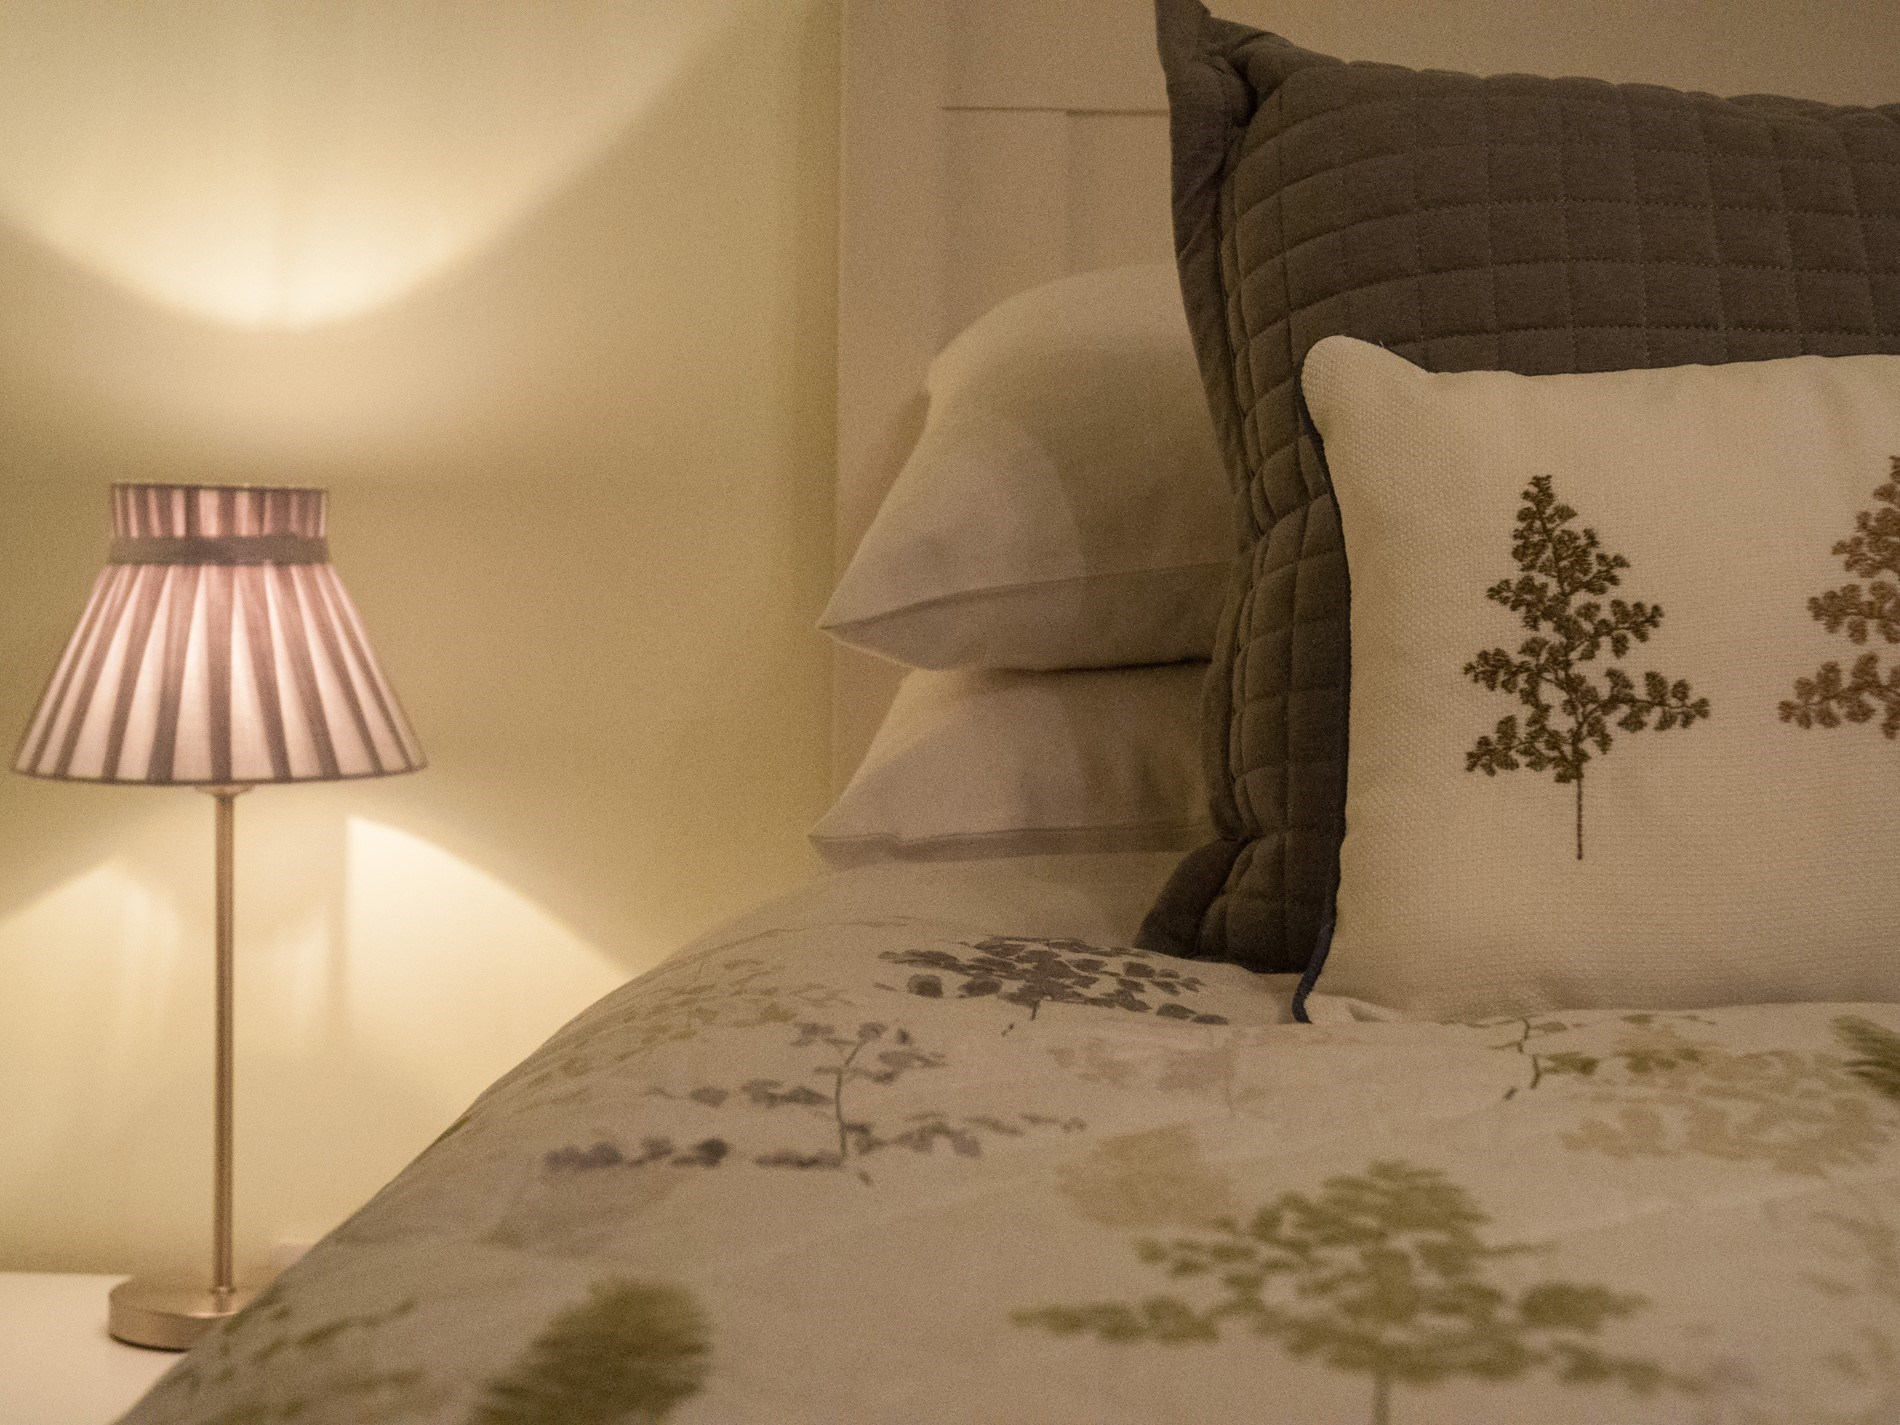 2 Bedroom Cottage in Launceston, Devon